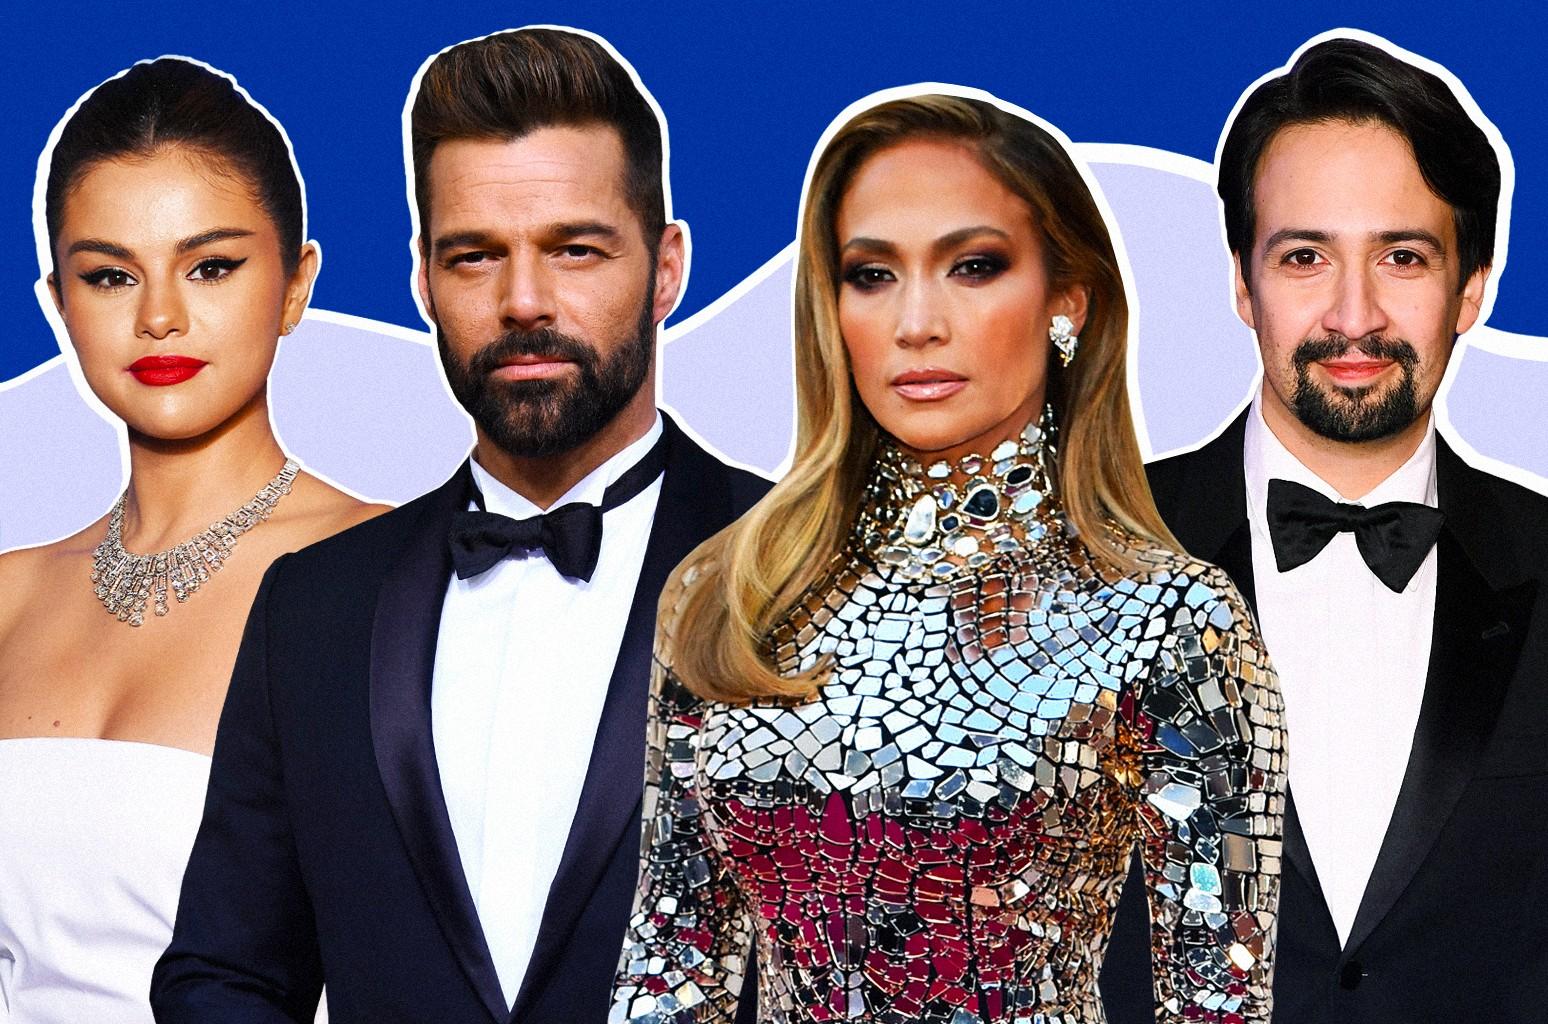 Selena Gomez, Ricky Martin, Jennifer Lopez and Lin-Manuel Miranda